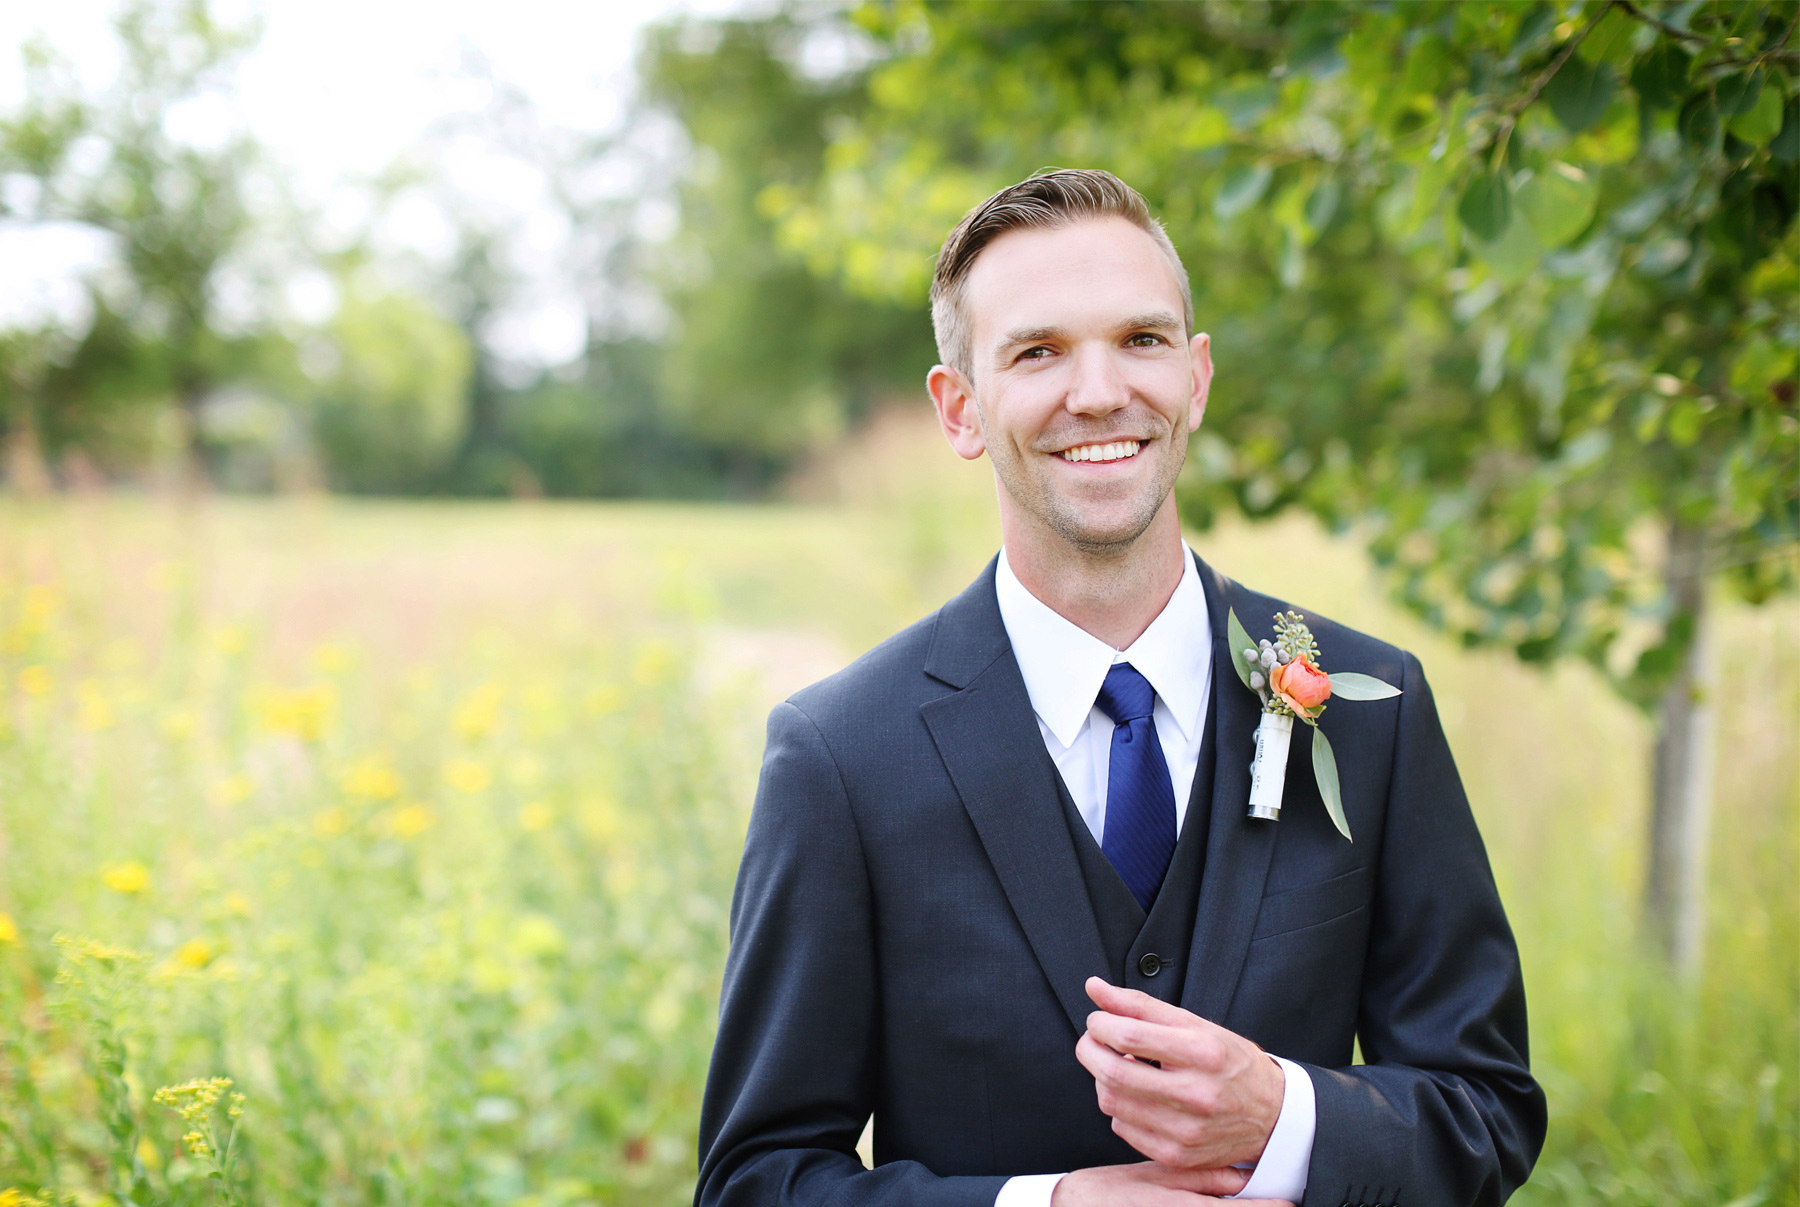 01-Minneapolis-Minnesota-Wedding-Photography-by-Vick-Photography-Field-First-Look-Jess-&-Jake.jpg